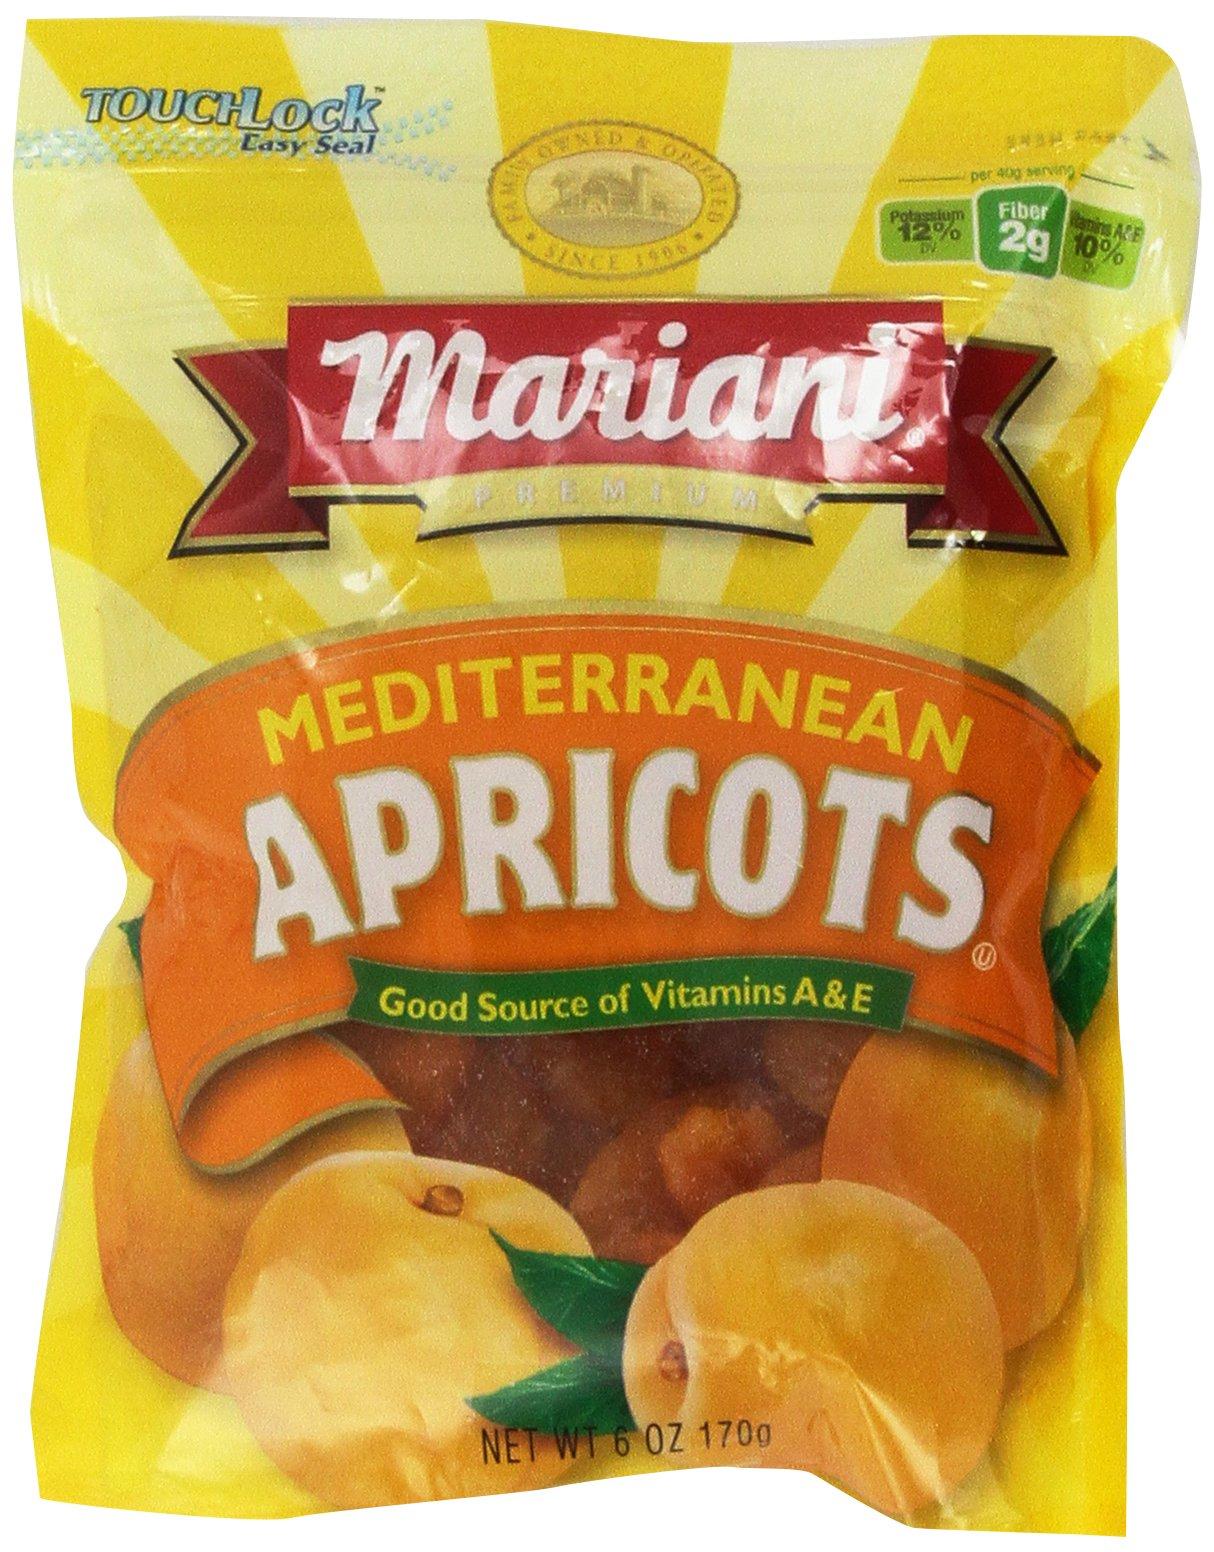 MARIANI MEDITERRANEAN APRICOTS 6oz 3pack